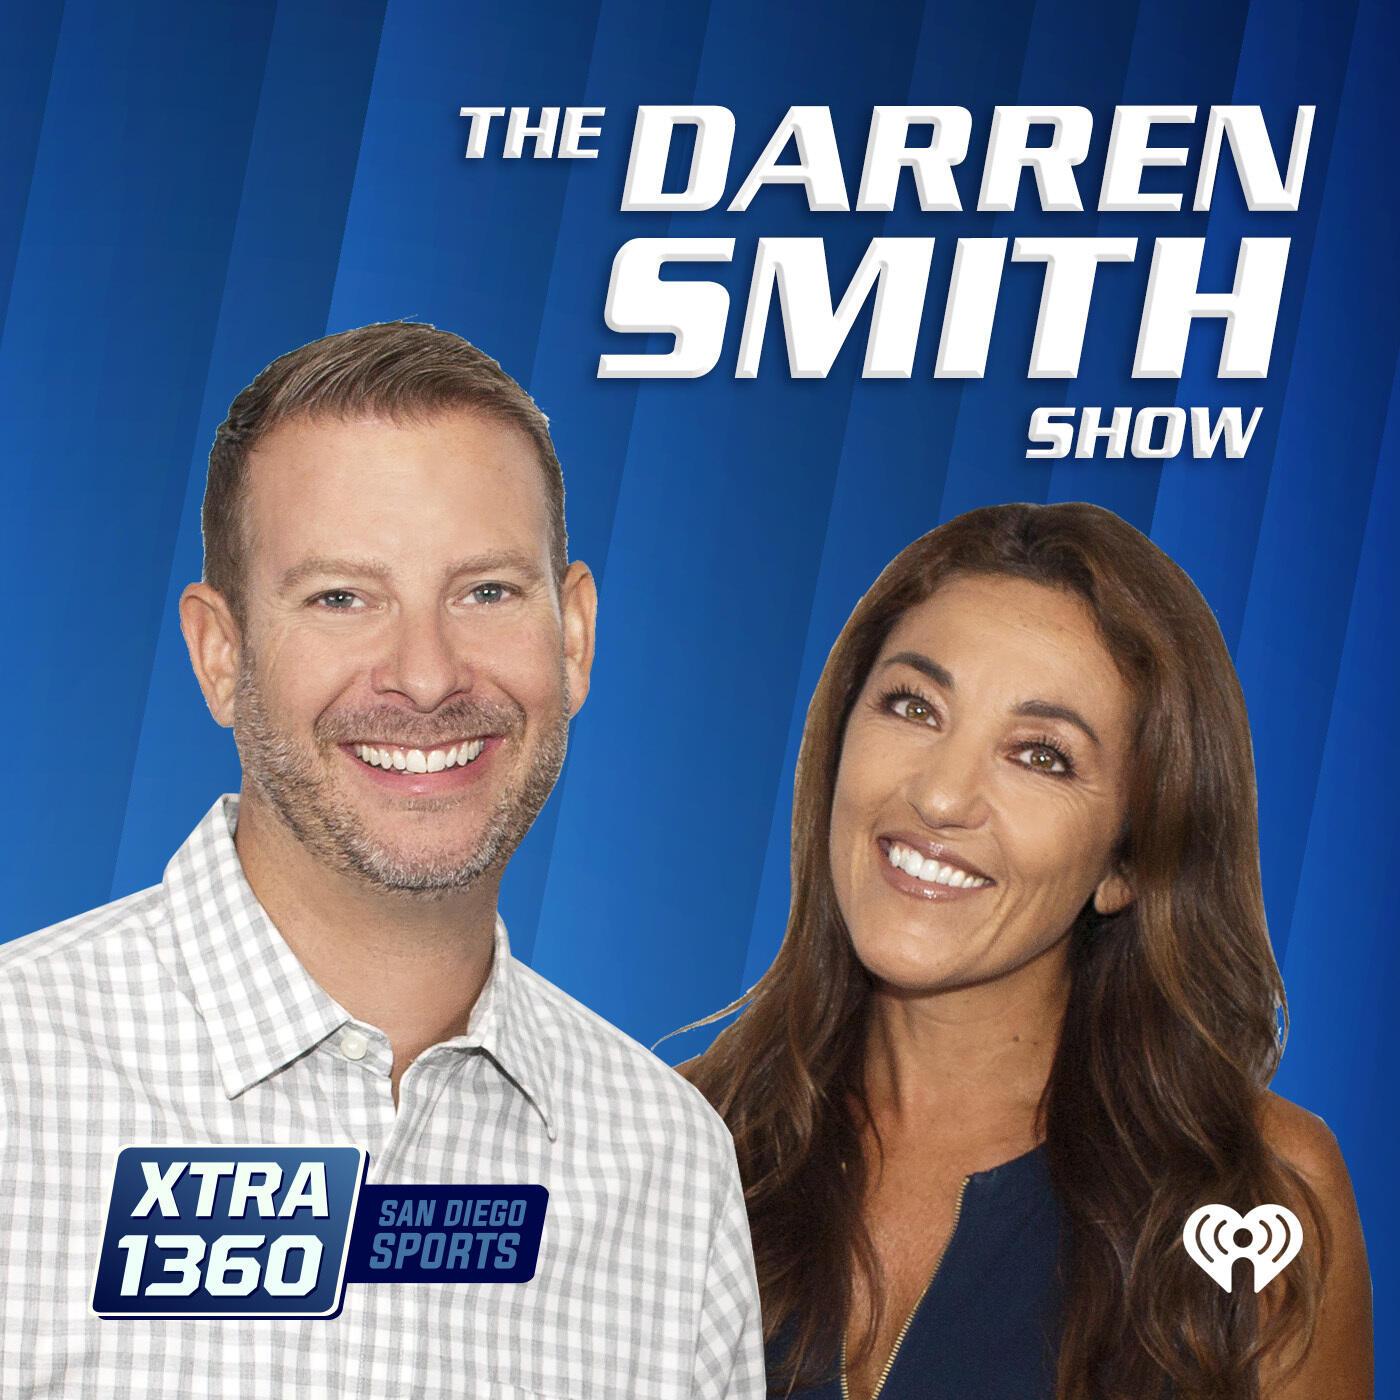 The Darren Smith Show